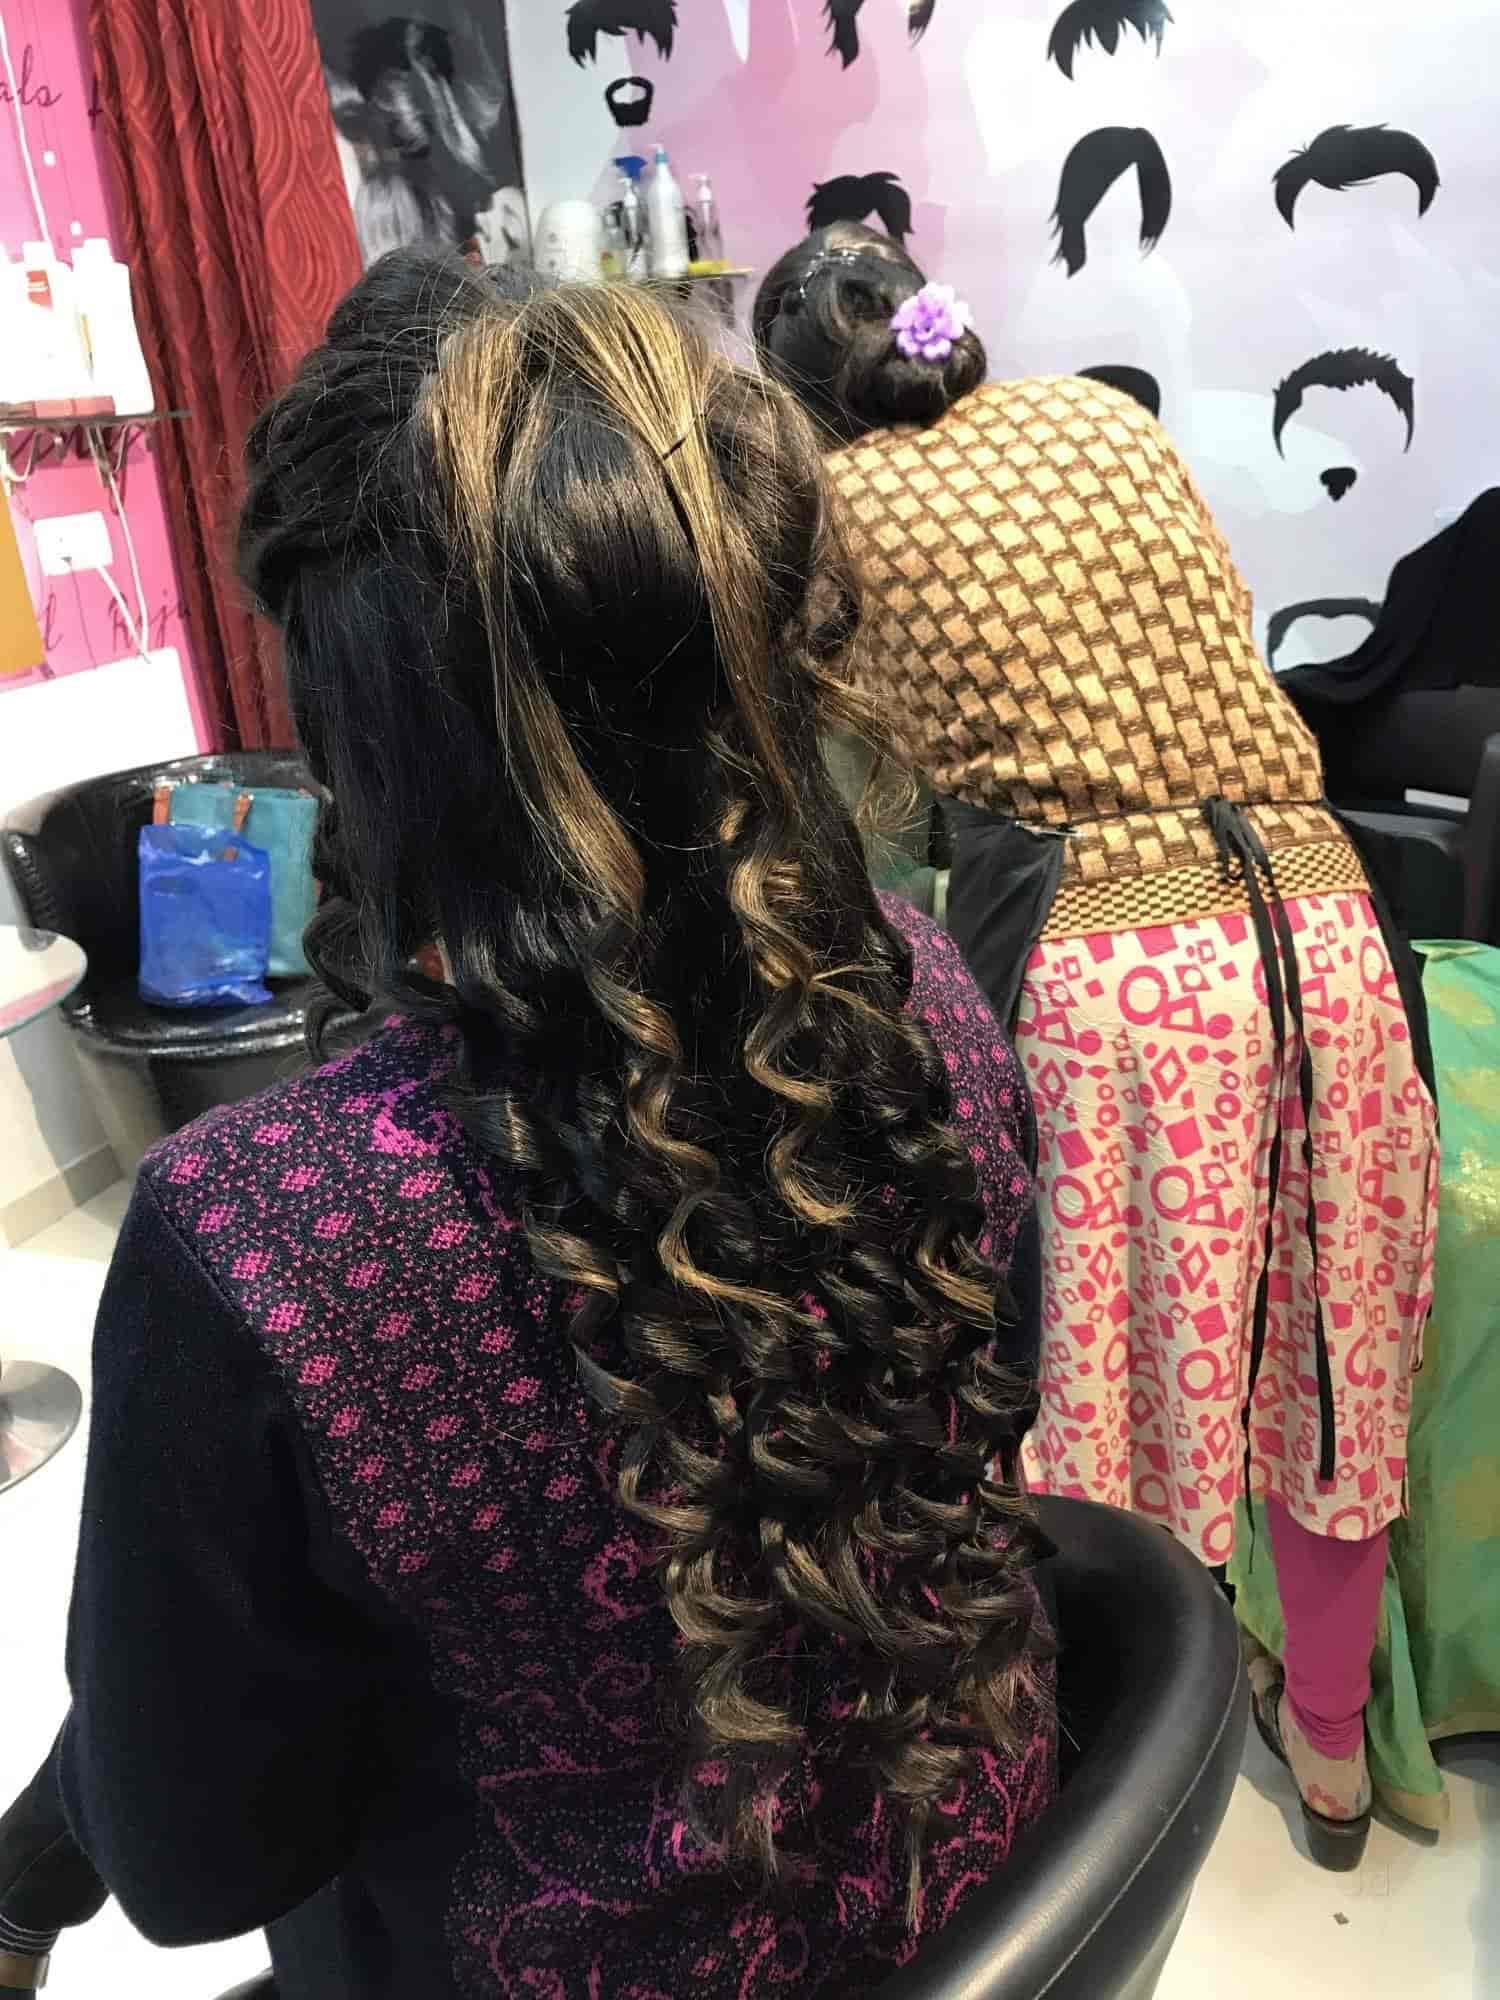 Tbc Express Salon Photos Garh Rd Meerut Meerut Pictures Images